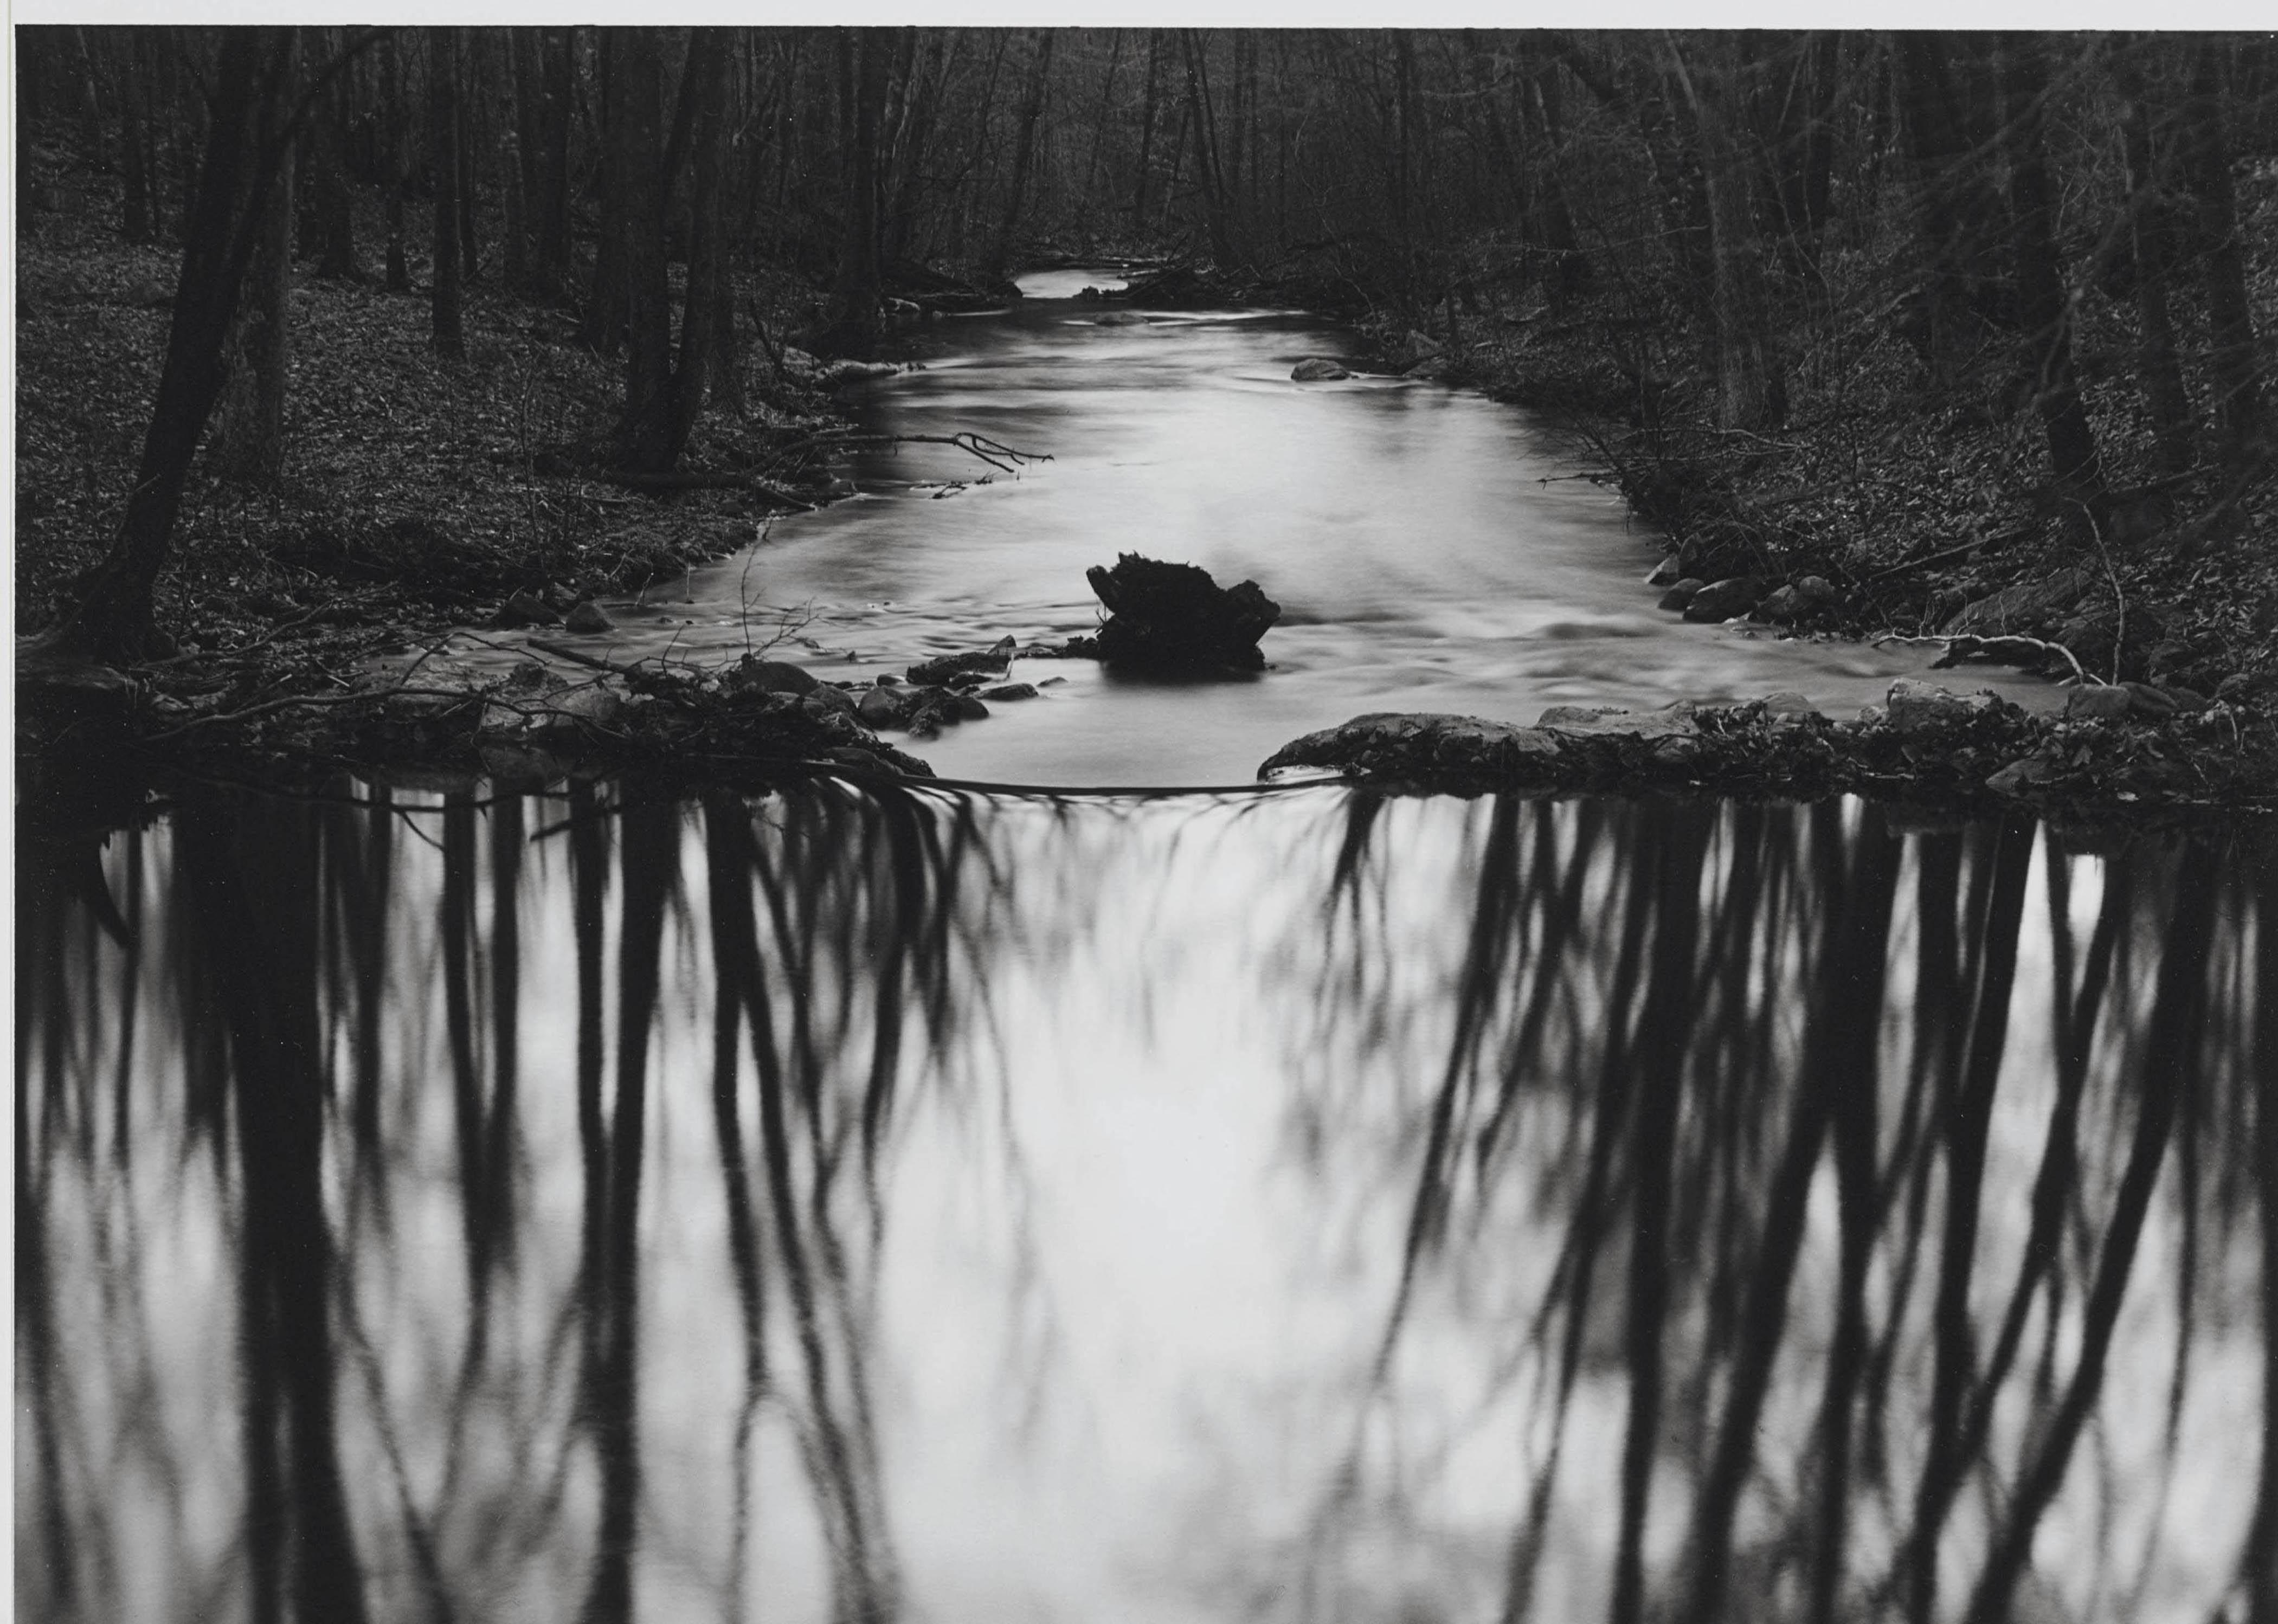 Woods Series, Redding, Connecticut, 1968